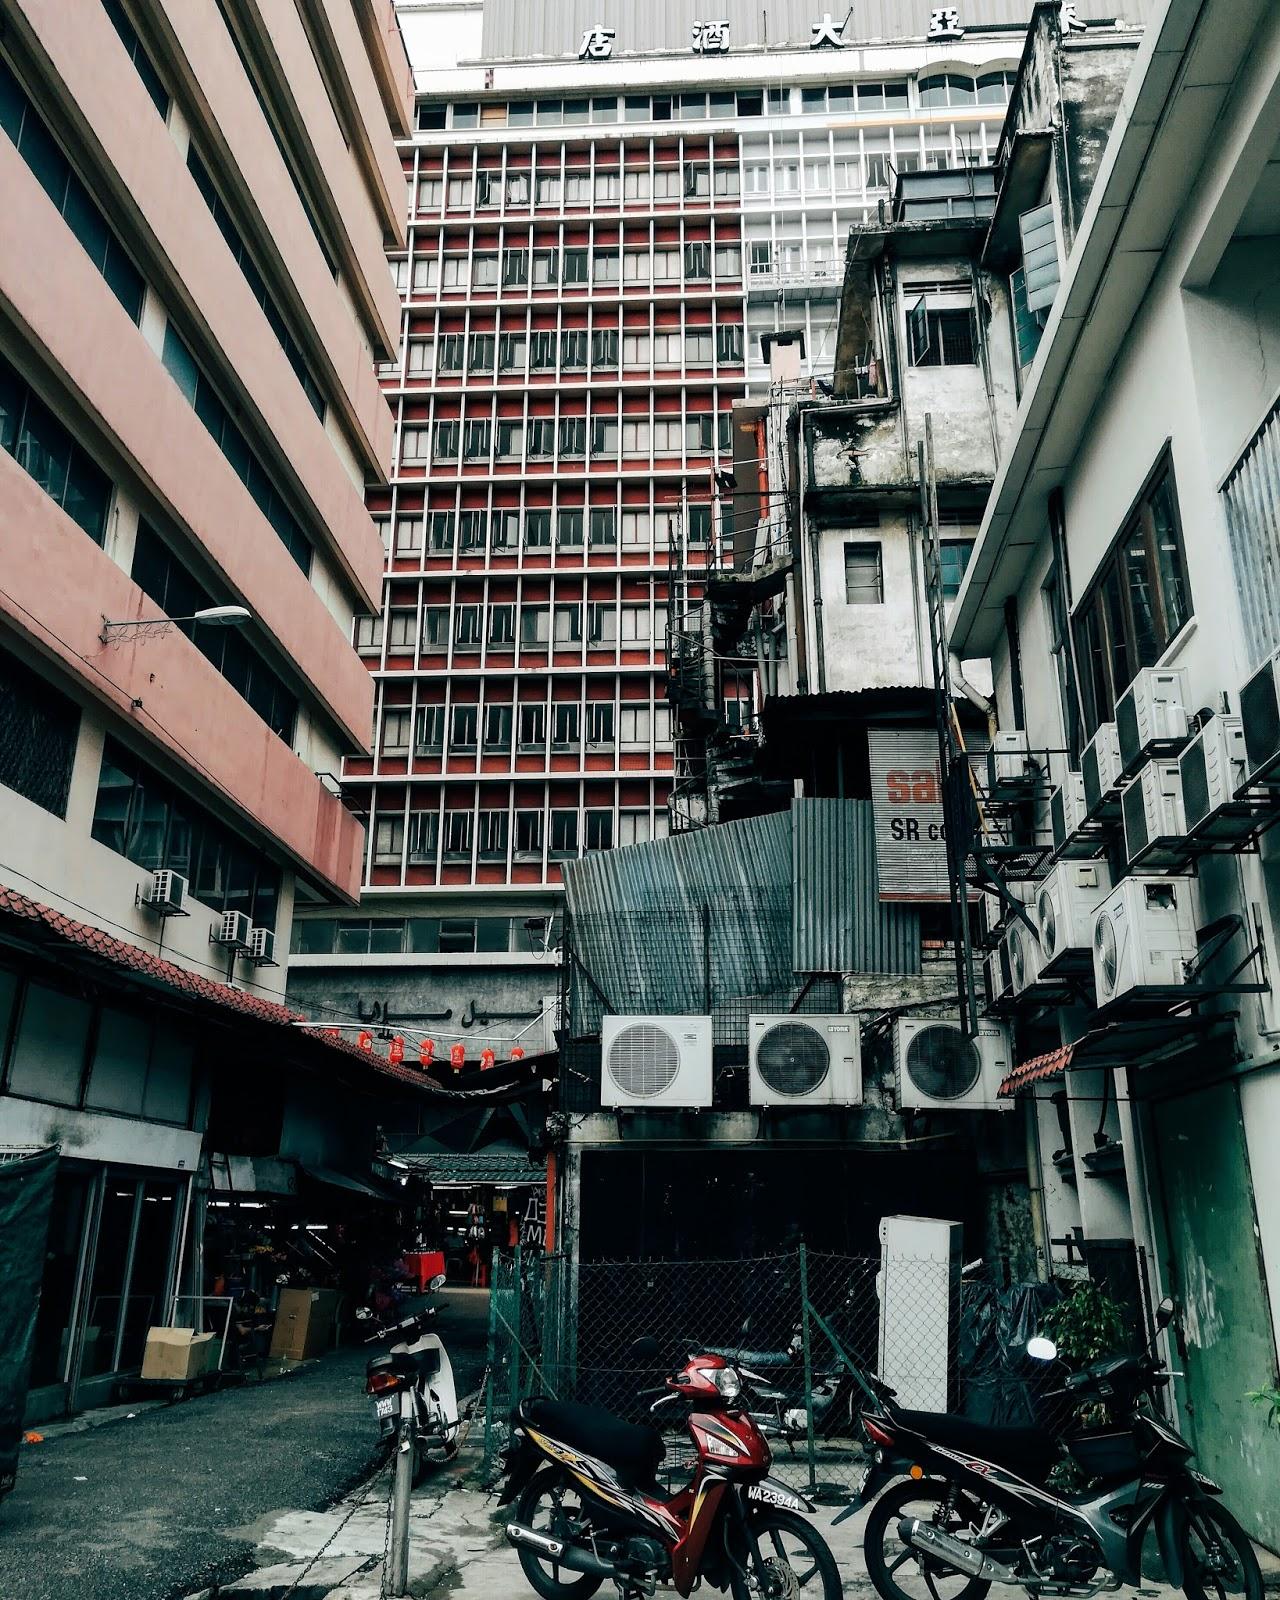 Jalan Tun H.S. Lee & Jalan Sultan Kuala Lumpur